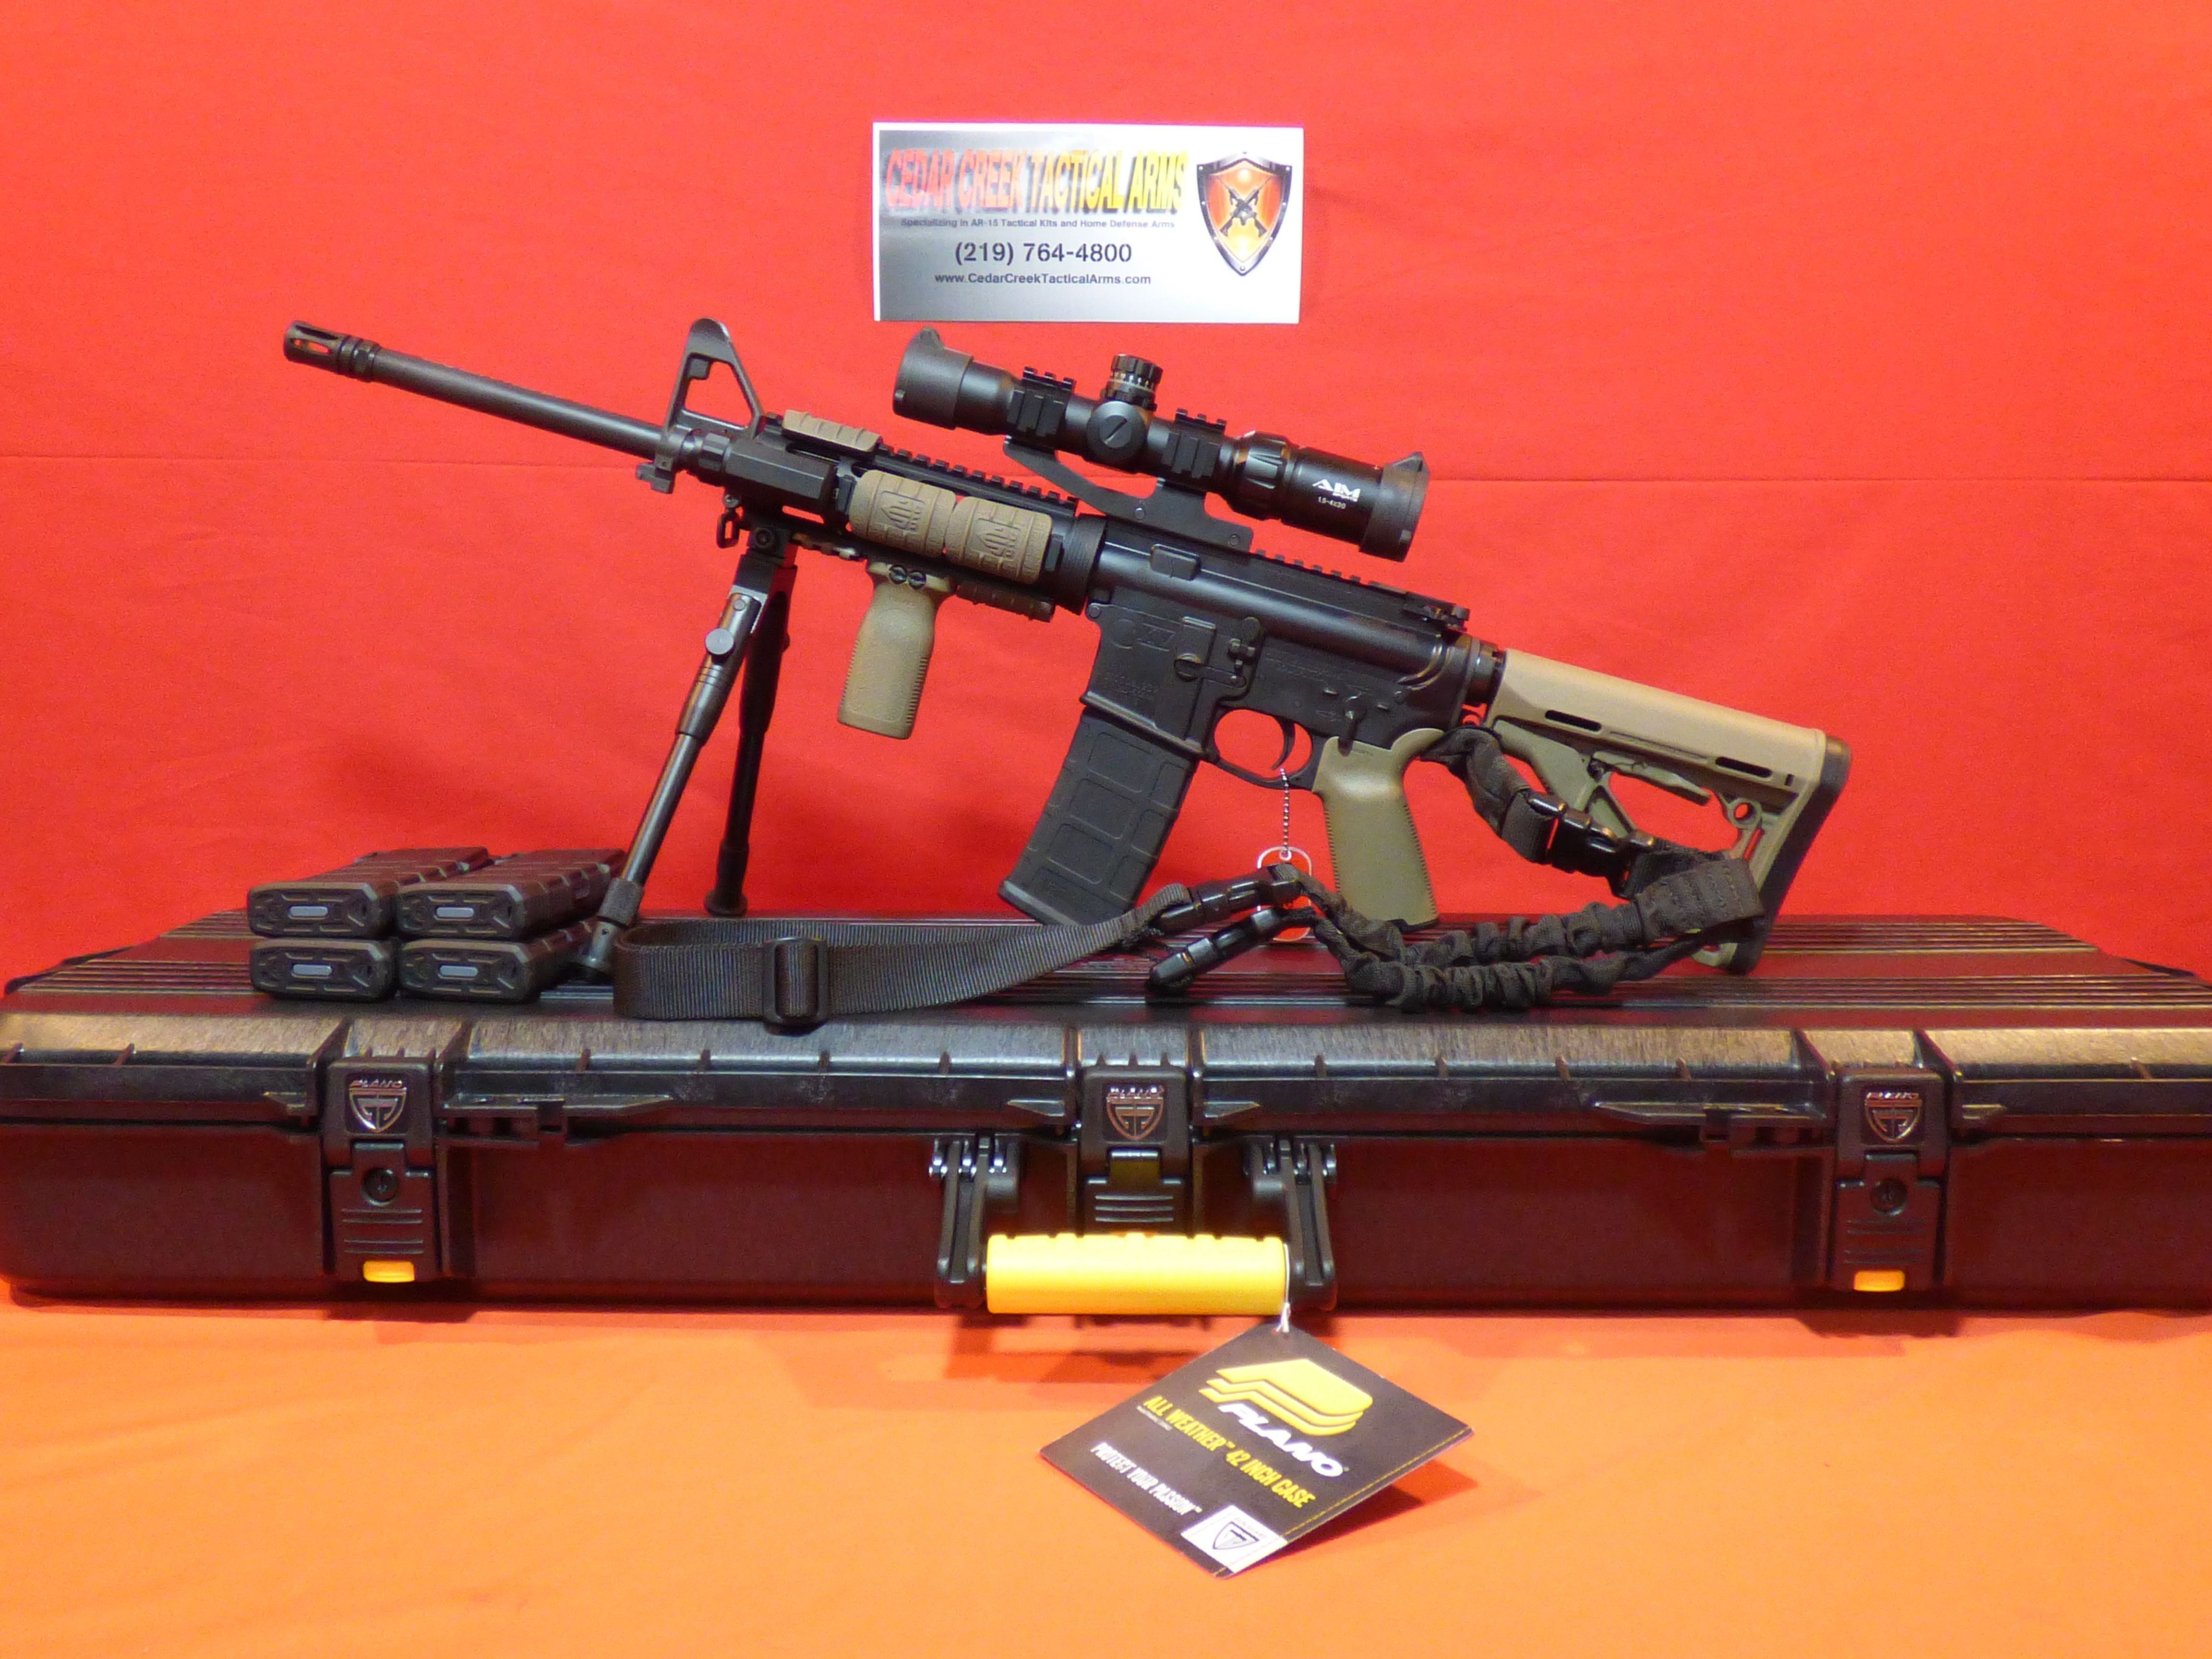 Core 15 tactical kit visit us at cedarcreektacticalarms